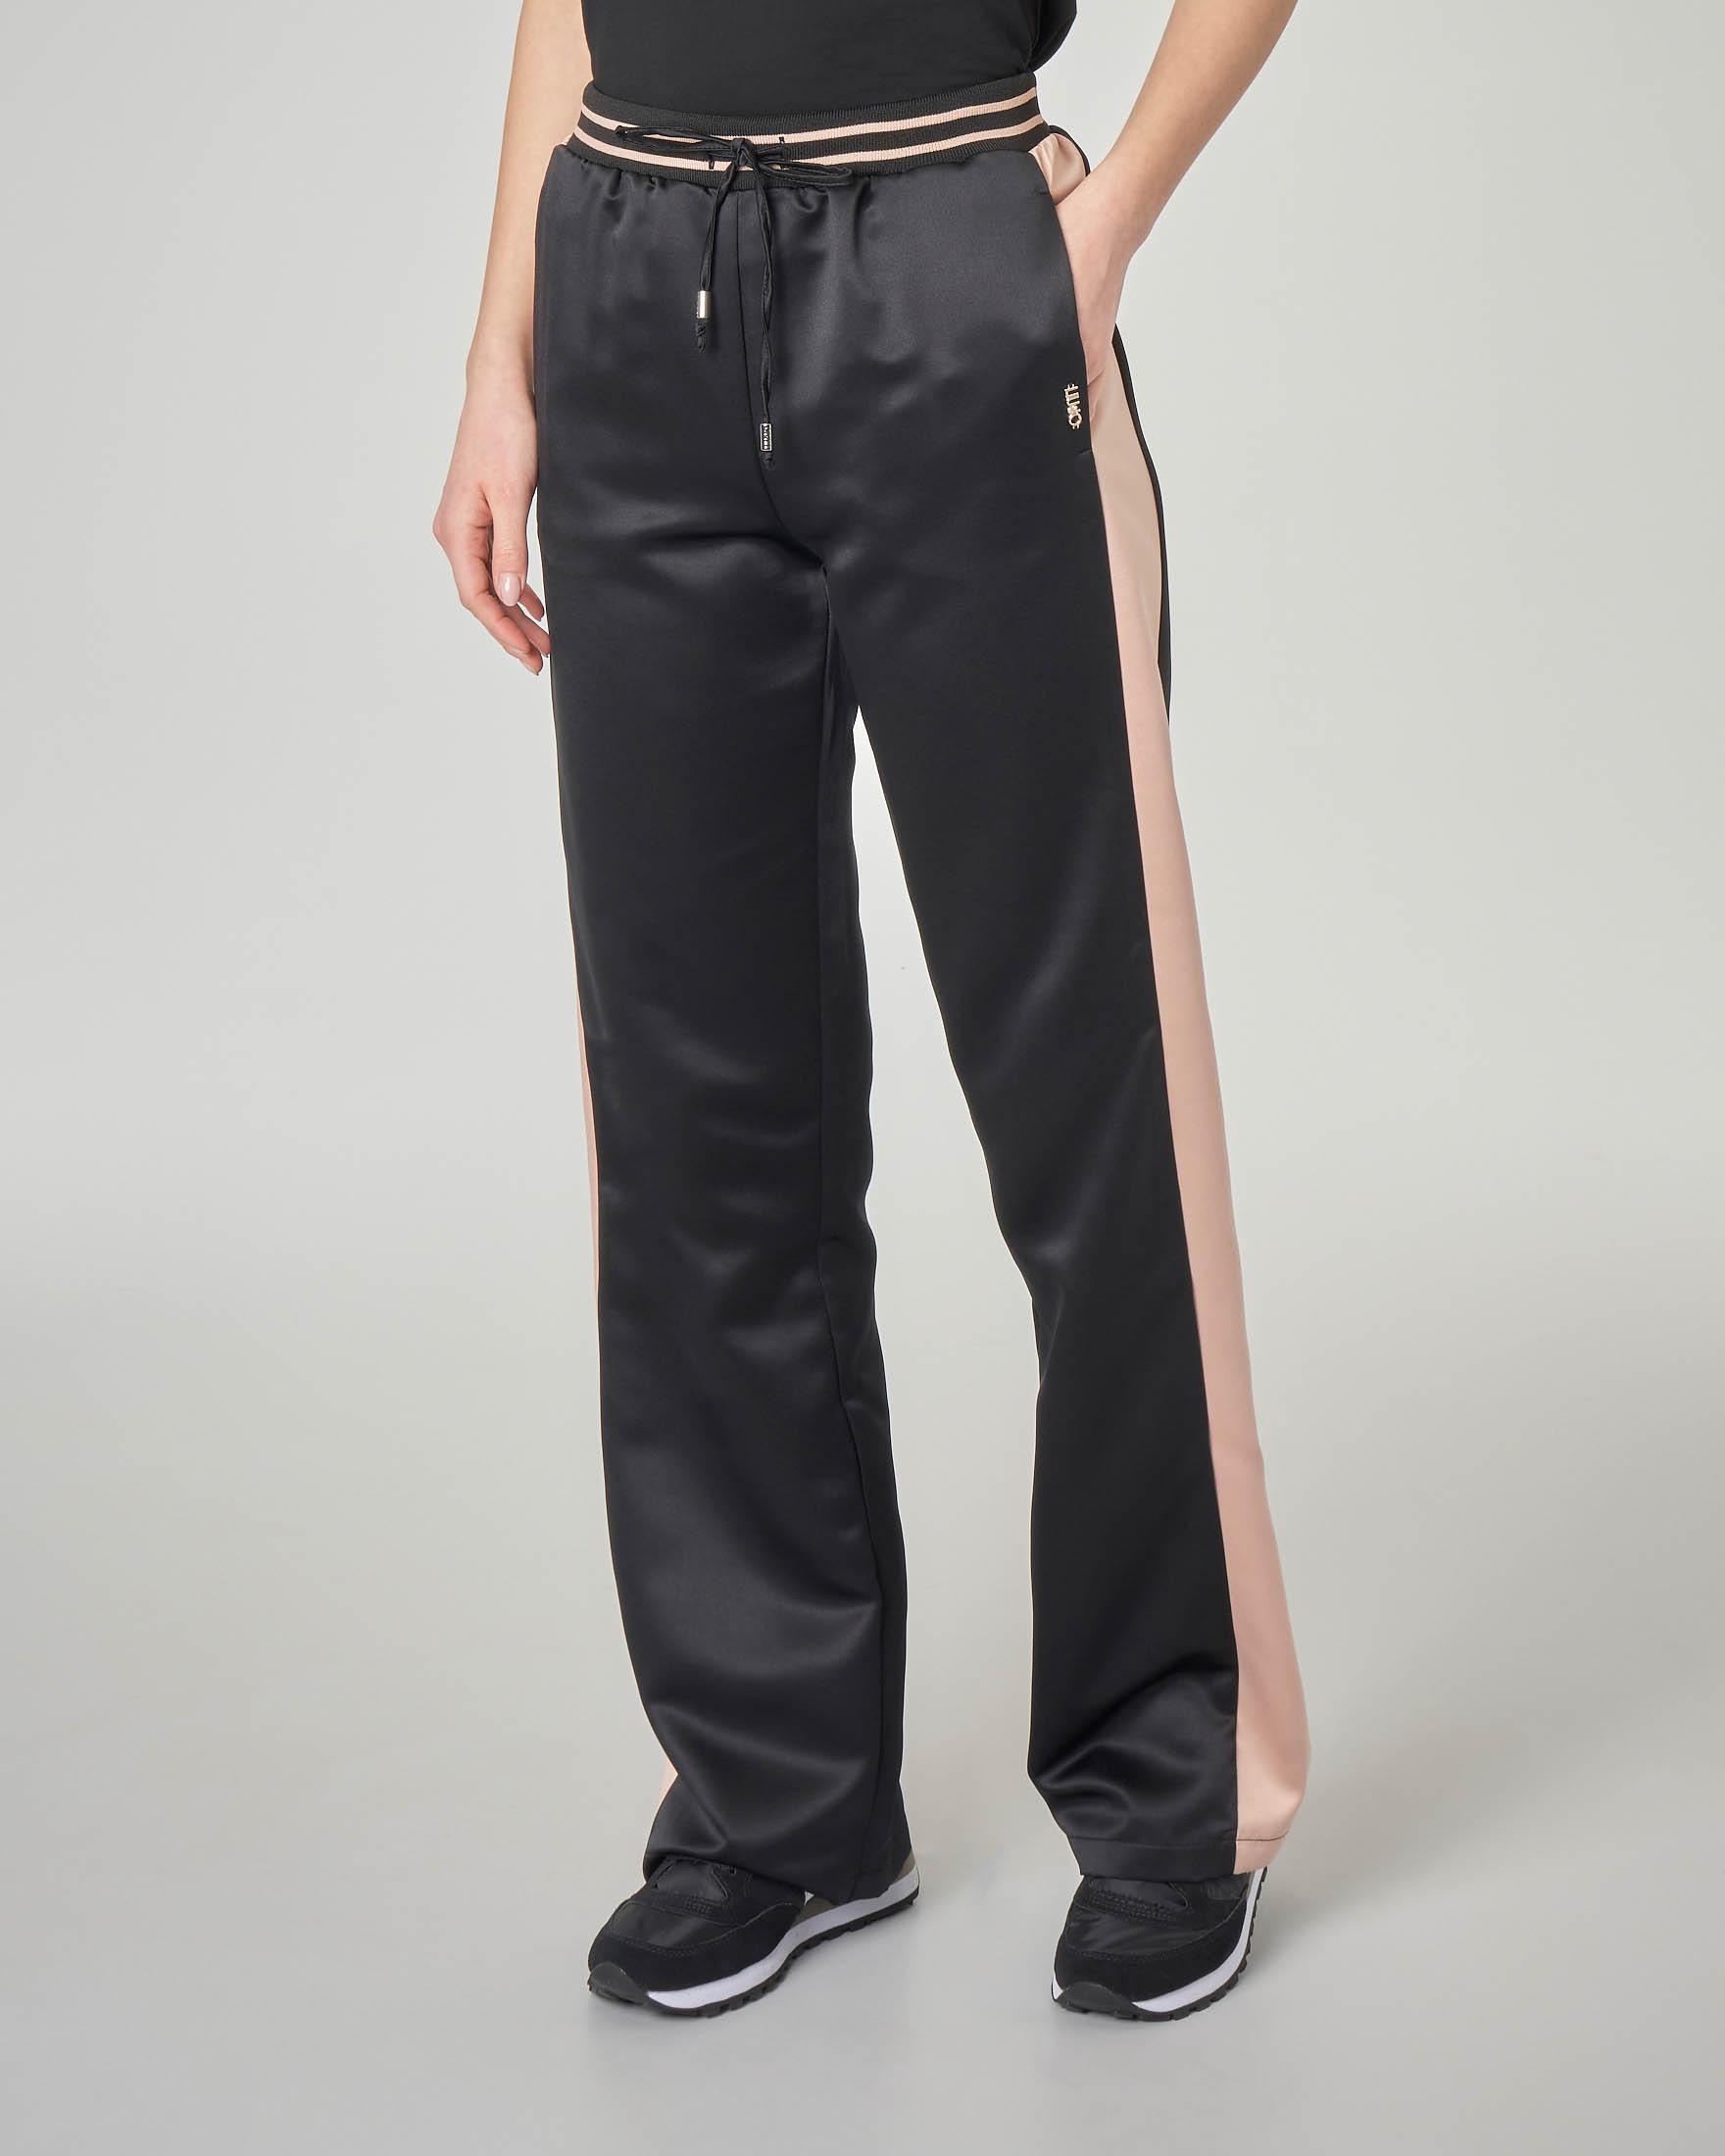 Pantaloni joggers neri con fascia laterale rosa